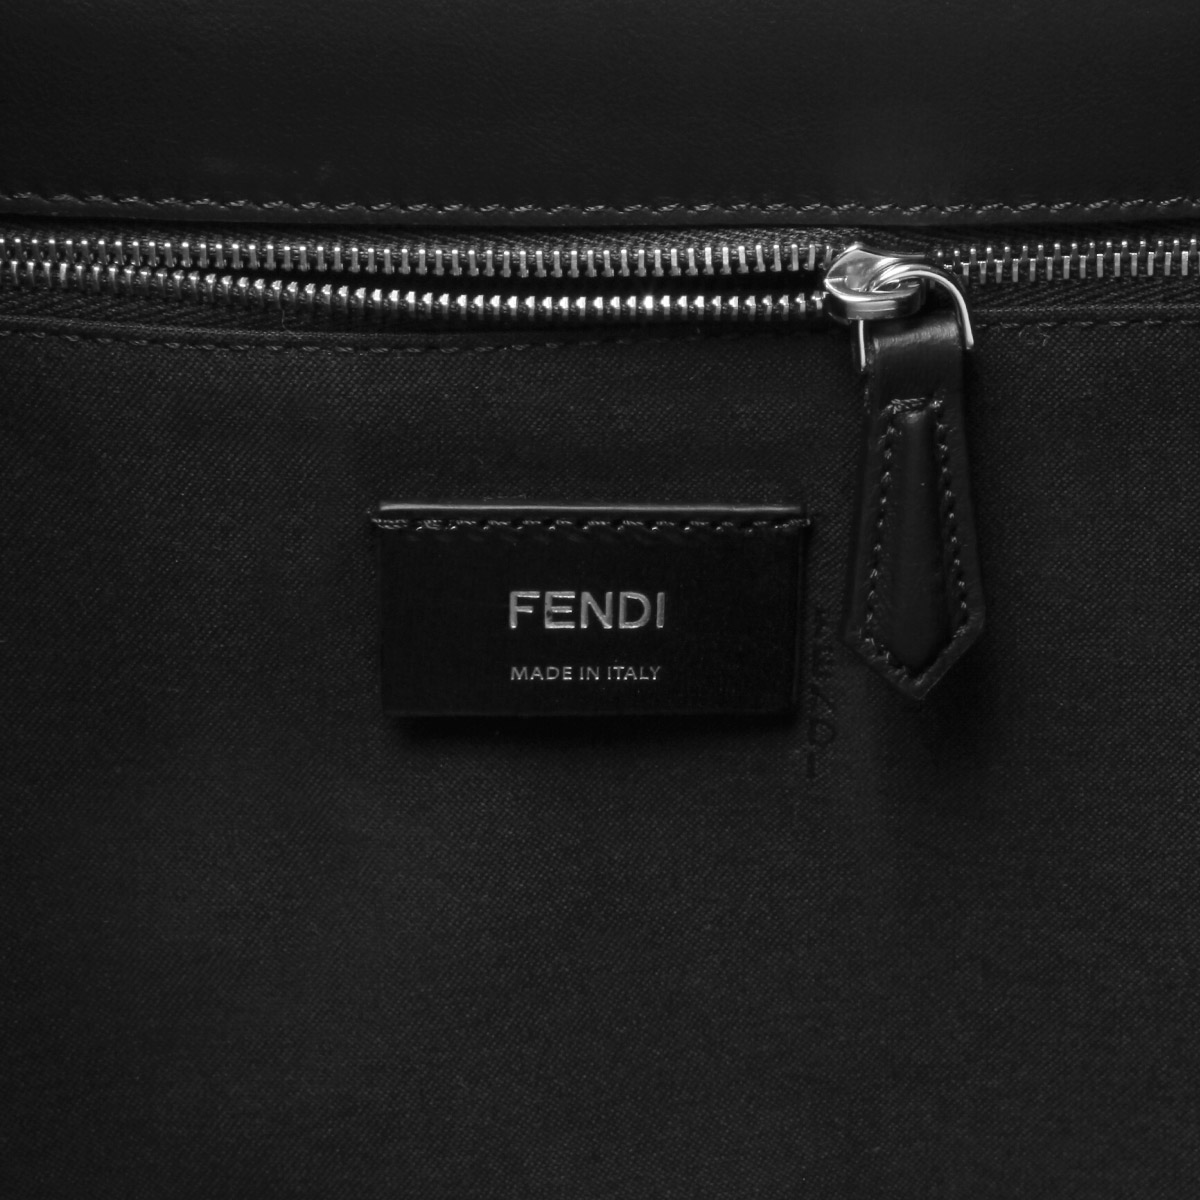 FENDI フェンディ | トートバッグ